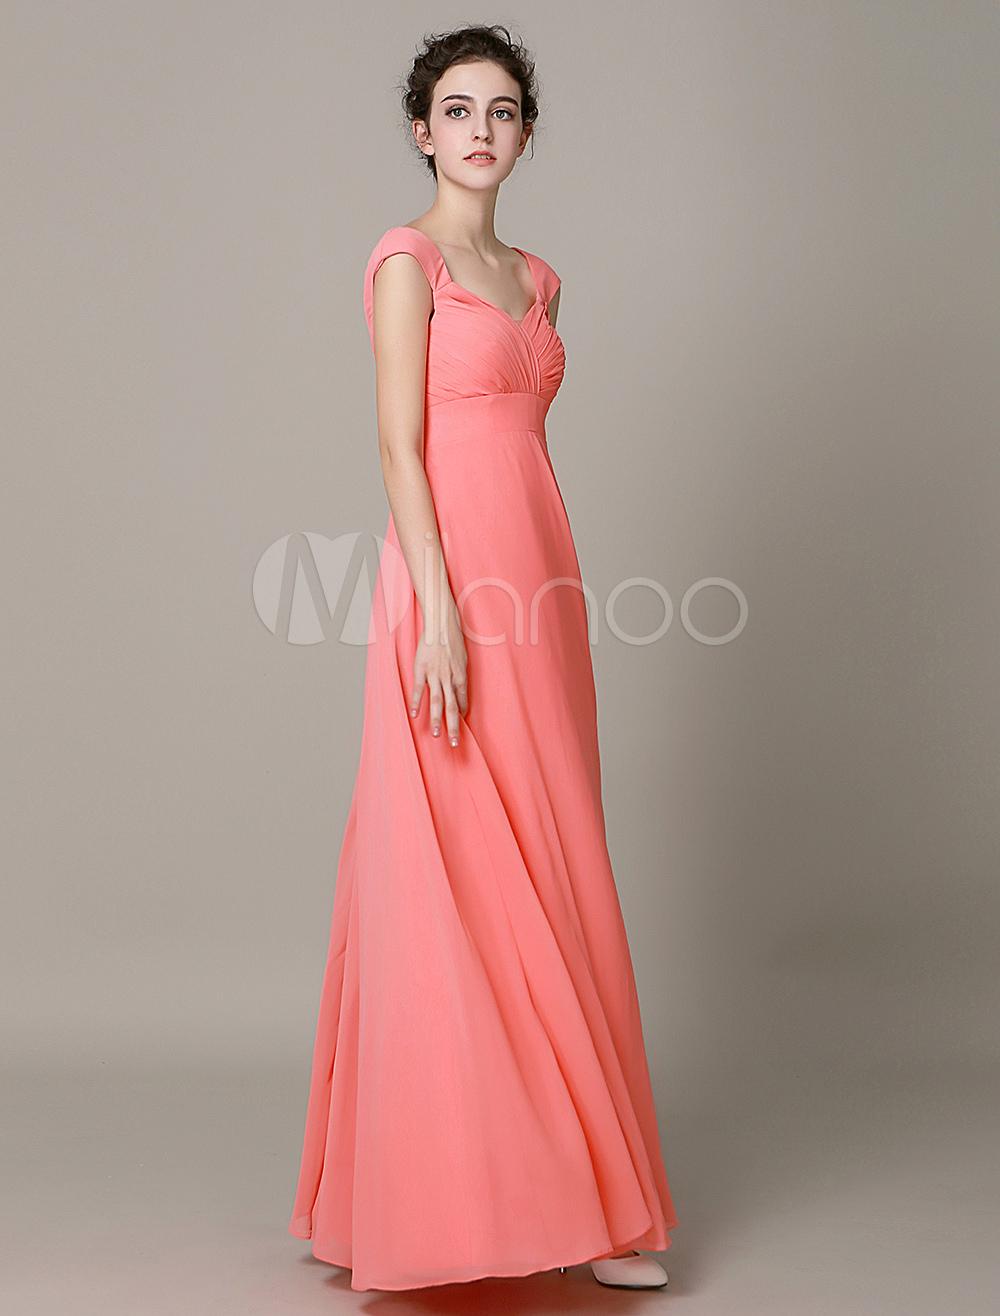 Chiffon Braidsmaid Dress Short Sleeves Backless Pleated Maternity Braidsmaid Dress